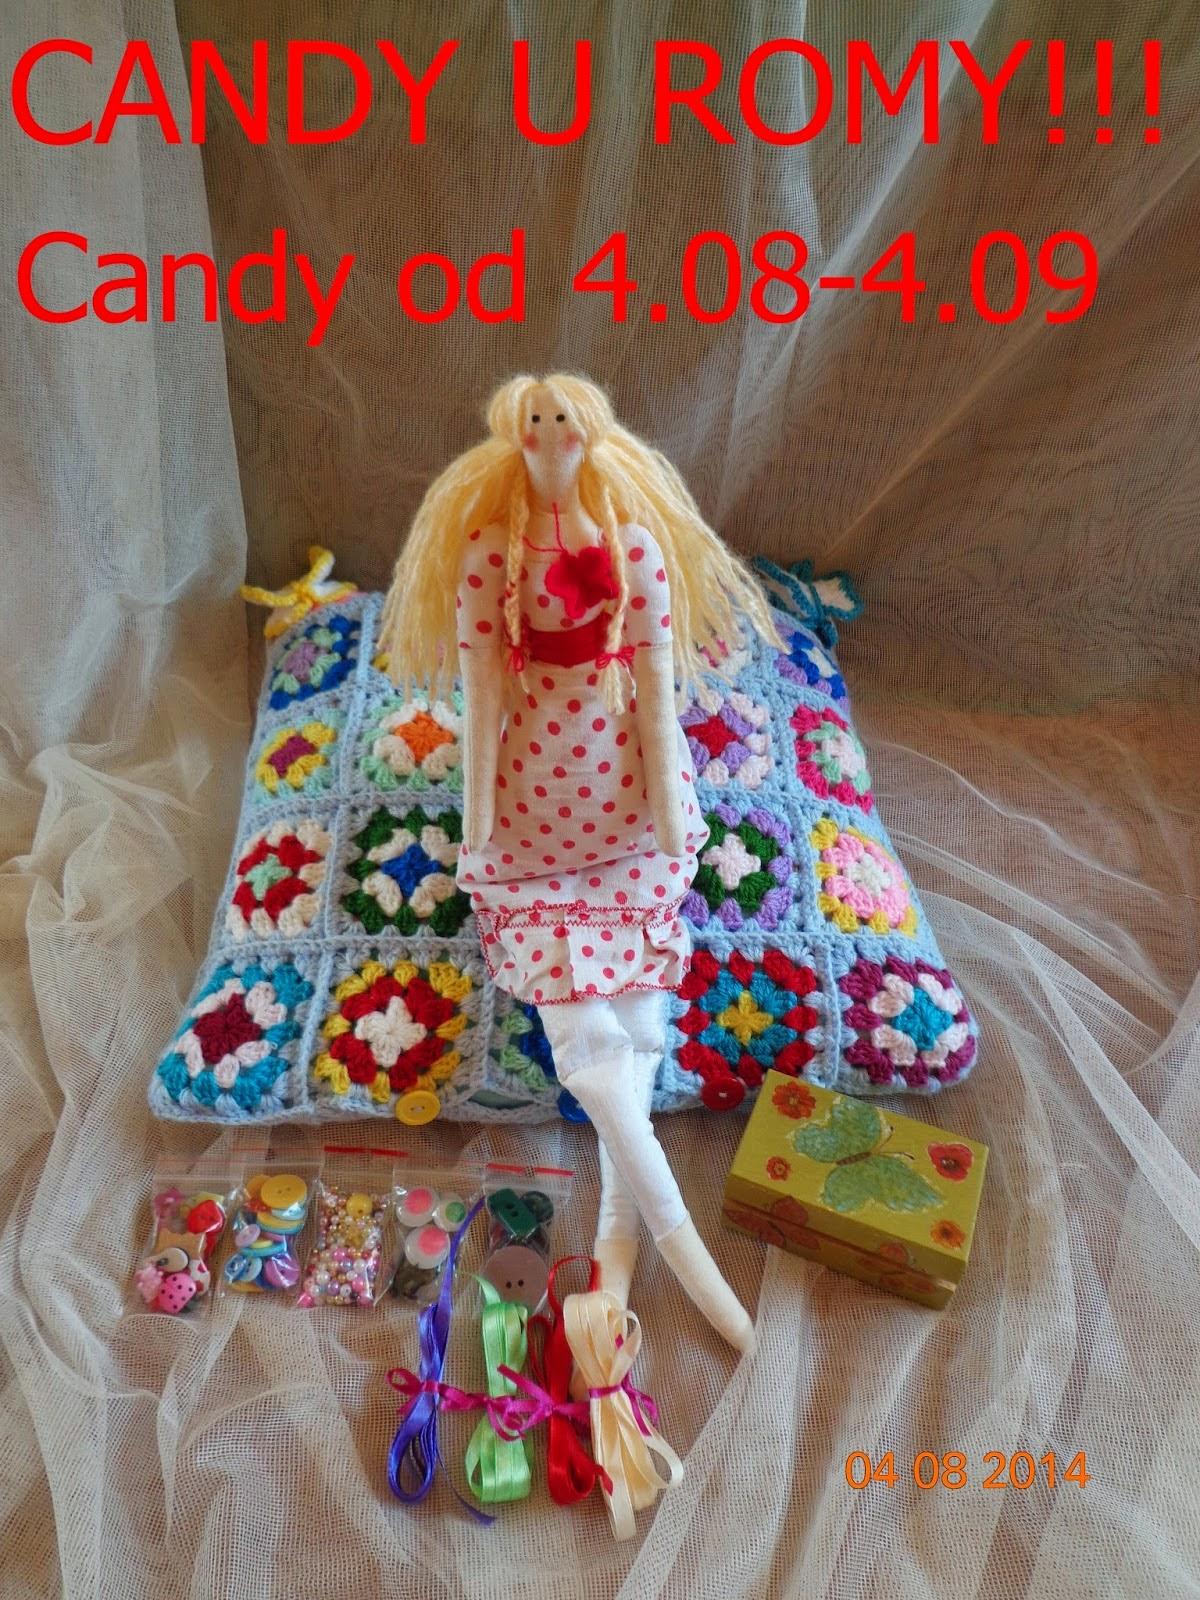 Candy u Romy do 4.09